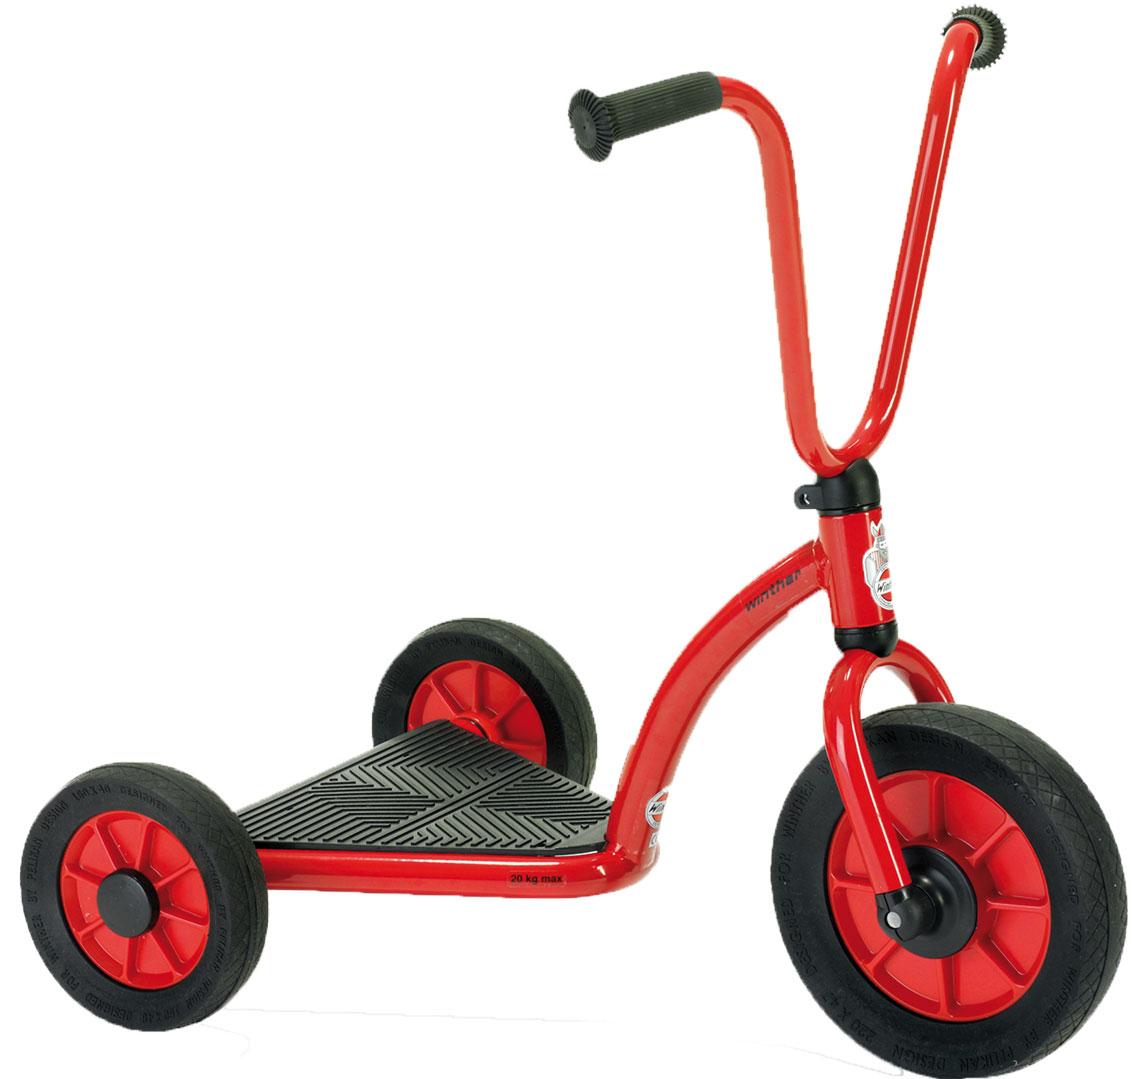 Winther Mini Dreirad Roller - Kinderfahrzeug 2-4 Jahre